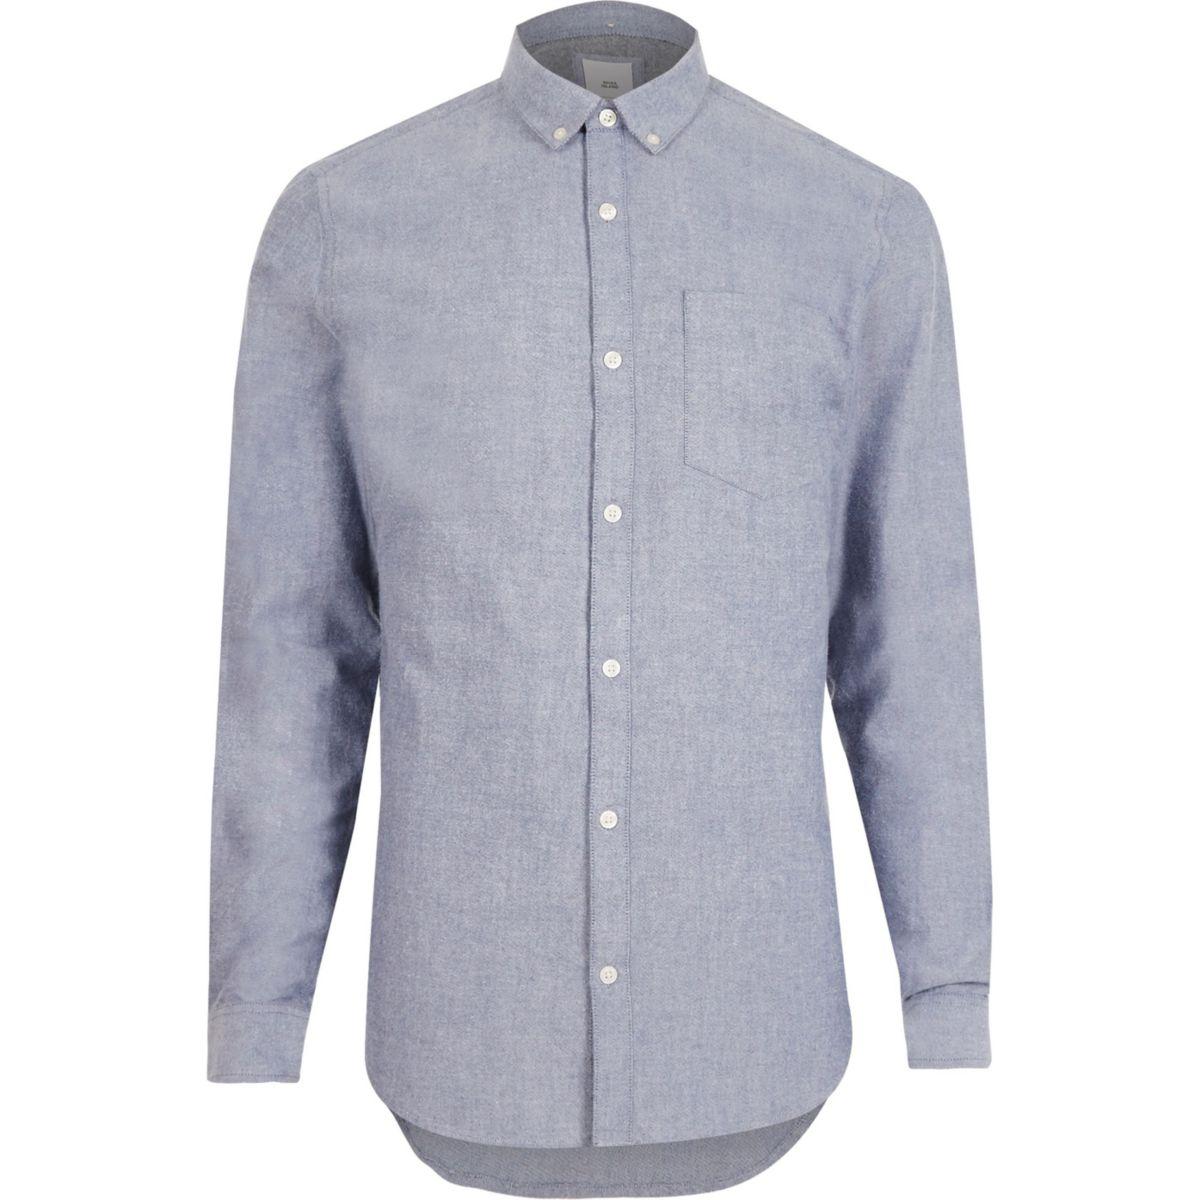 Light blue slim fit long sleeve Oxford shirt